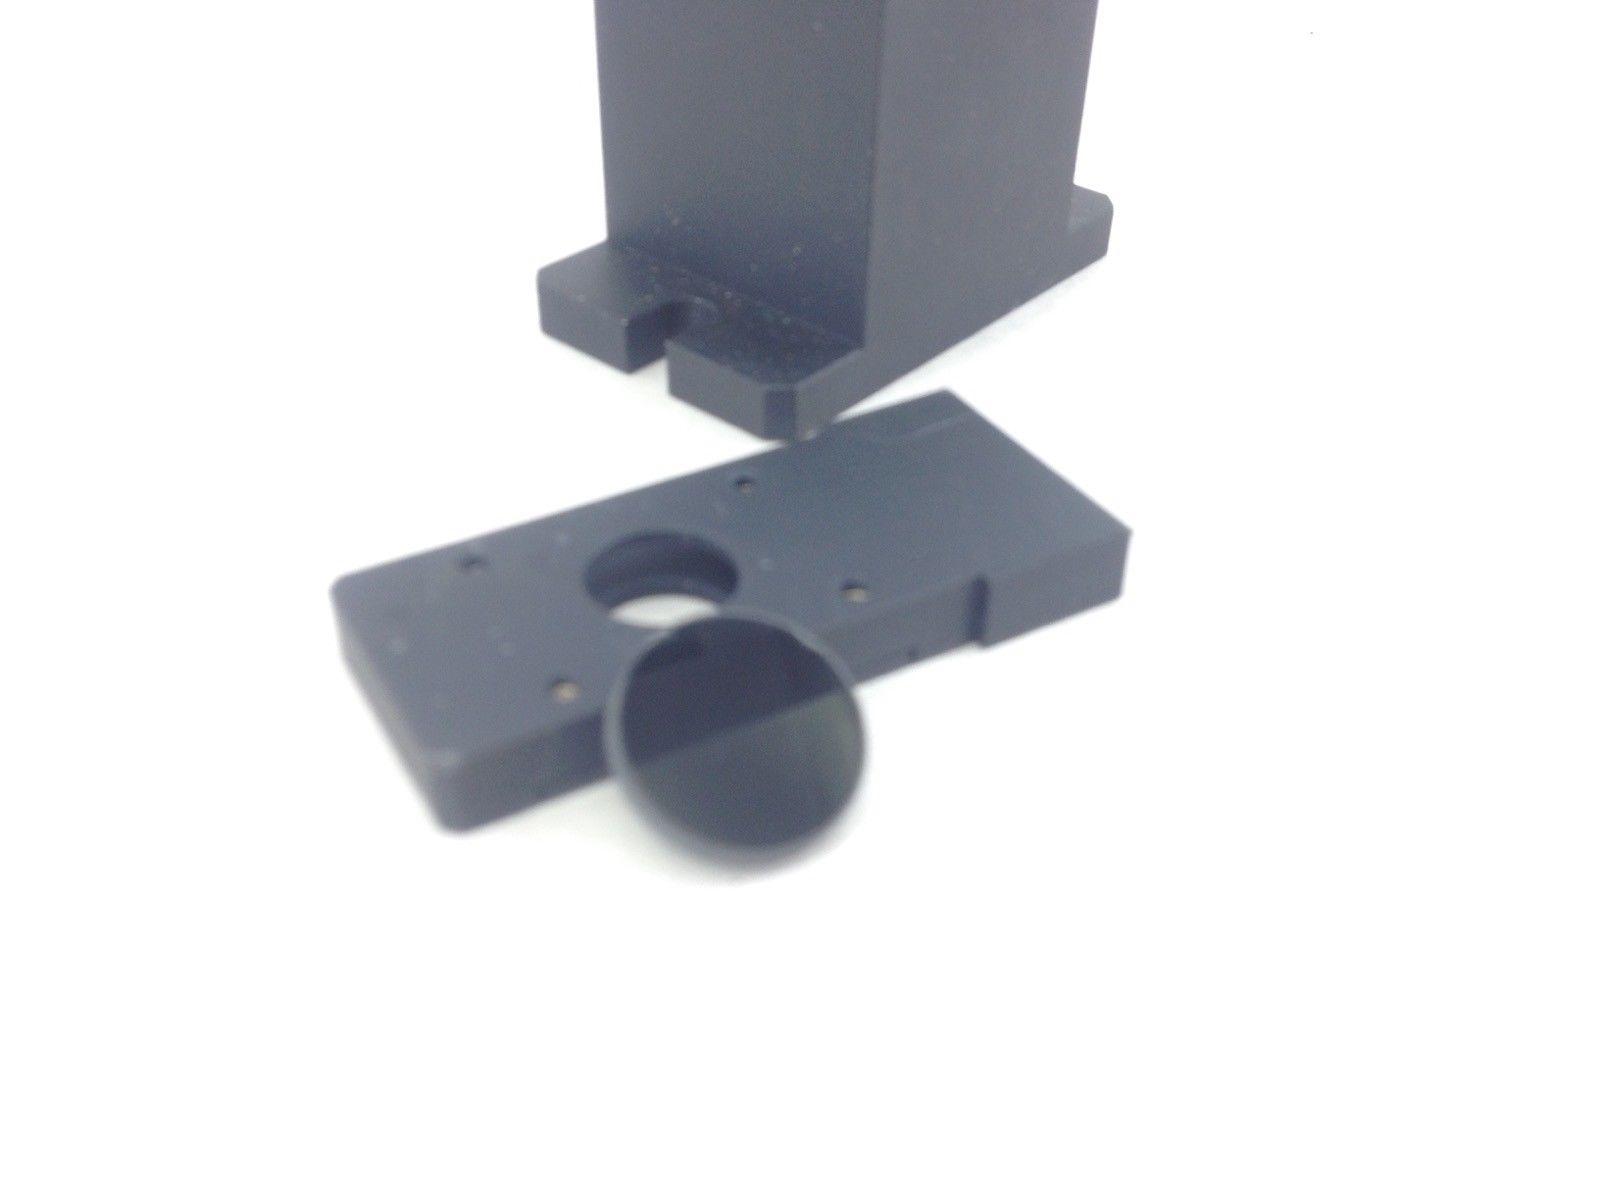 OPTOMECHANICAL ASSY W/ 021128 MICRO-CONTROLLER BOARD (H330) 2